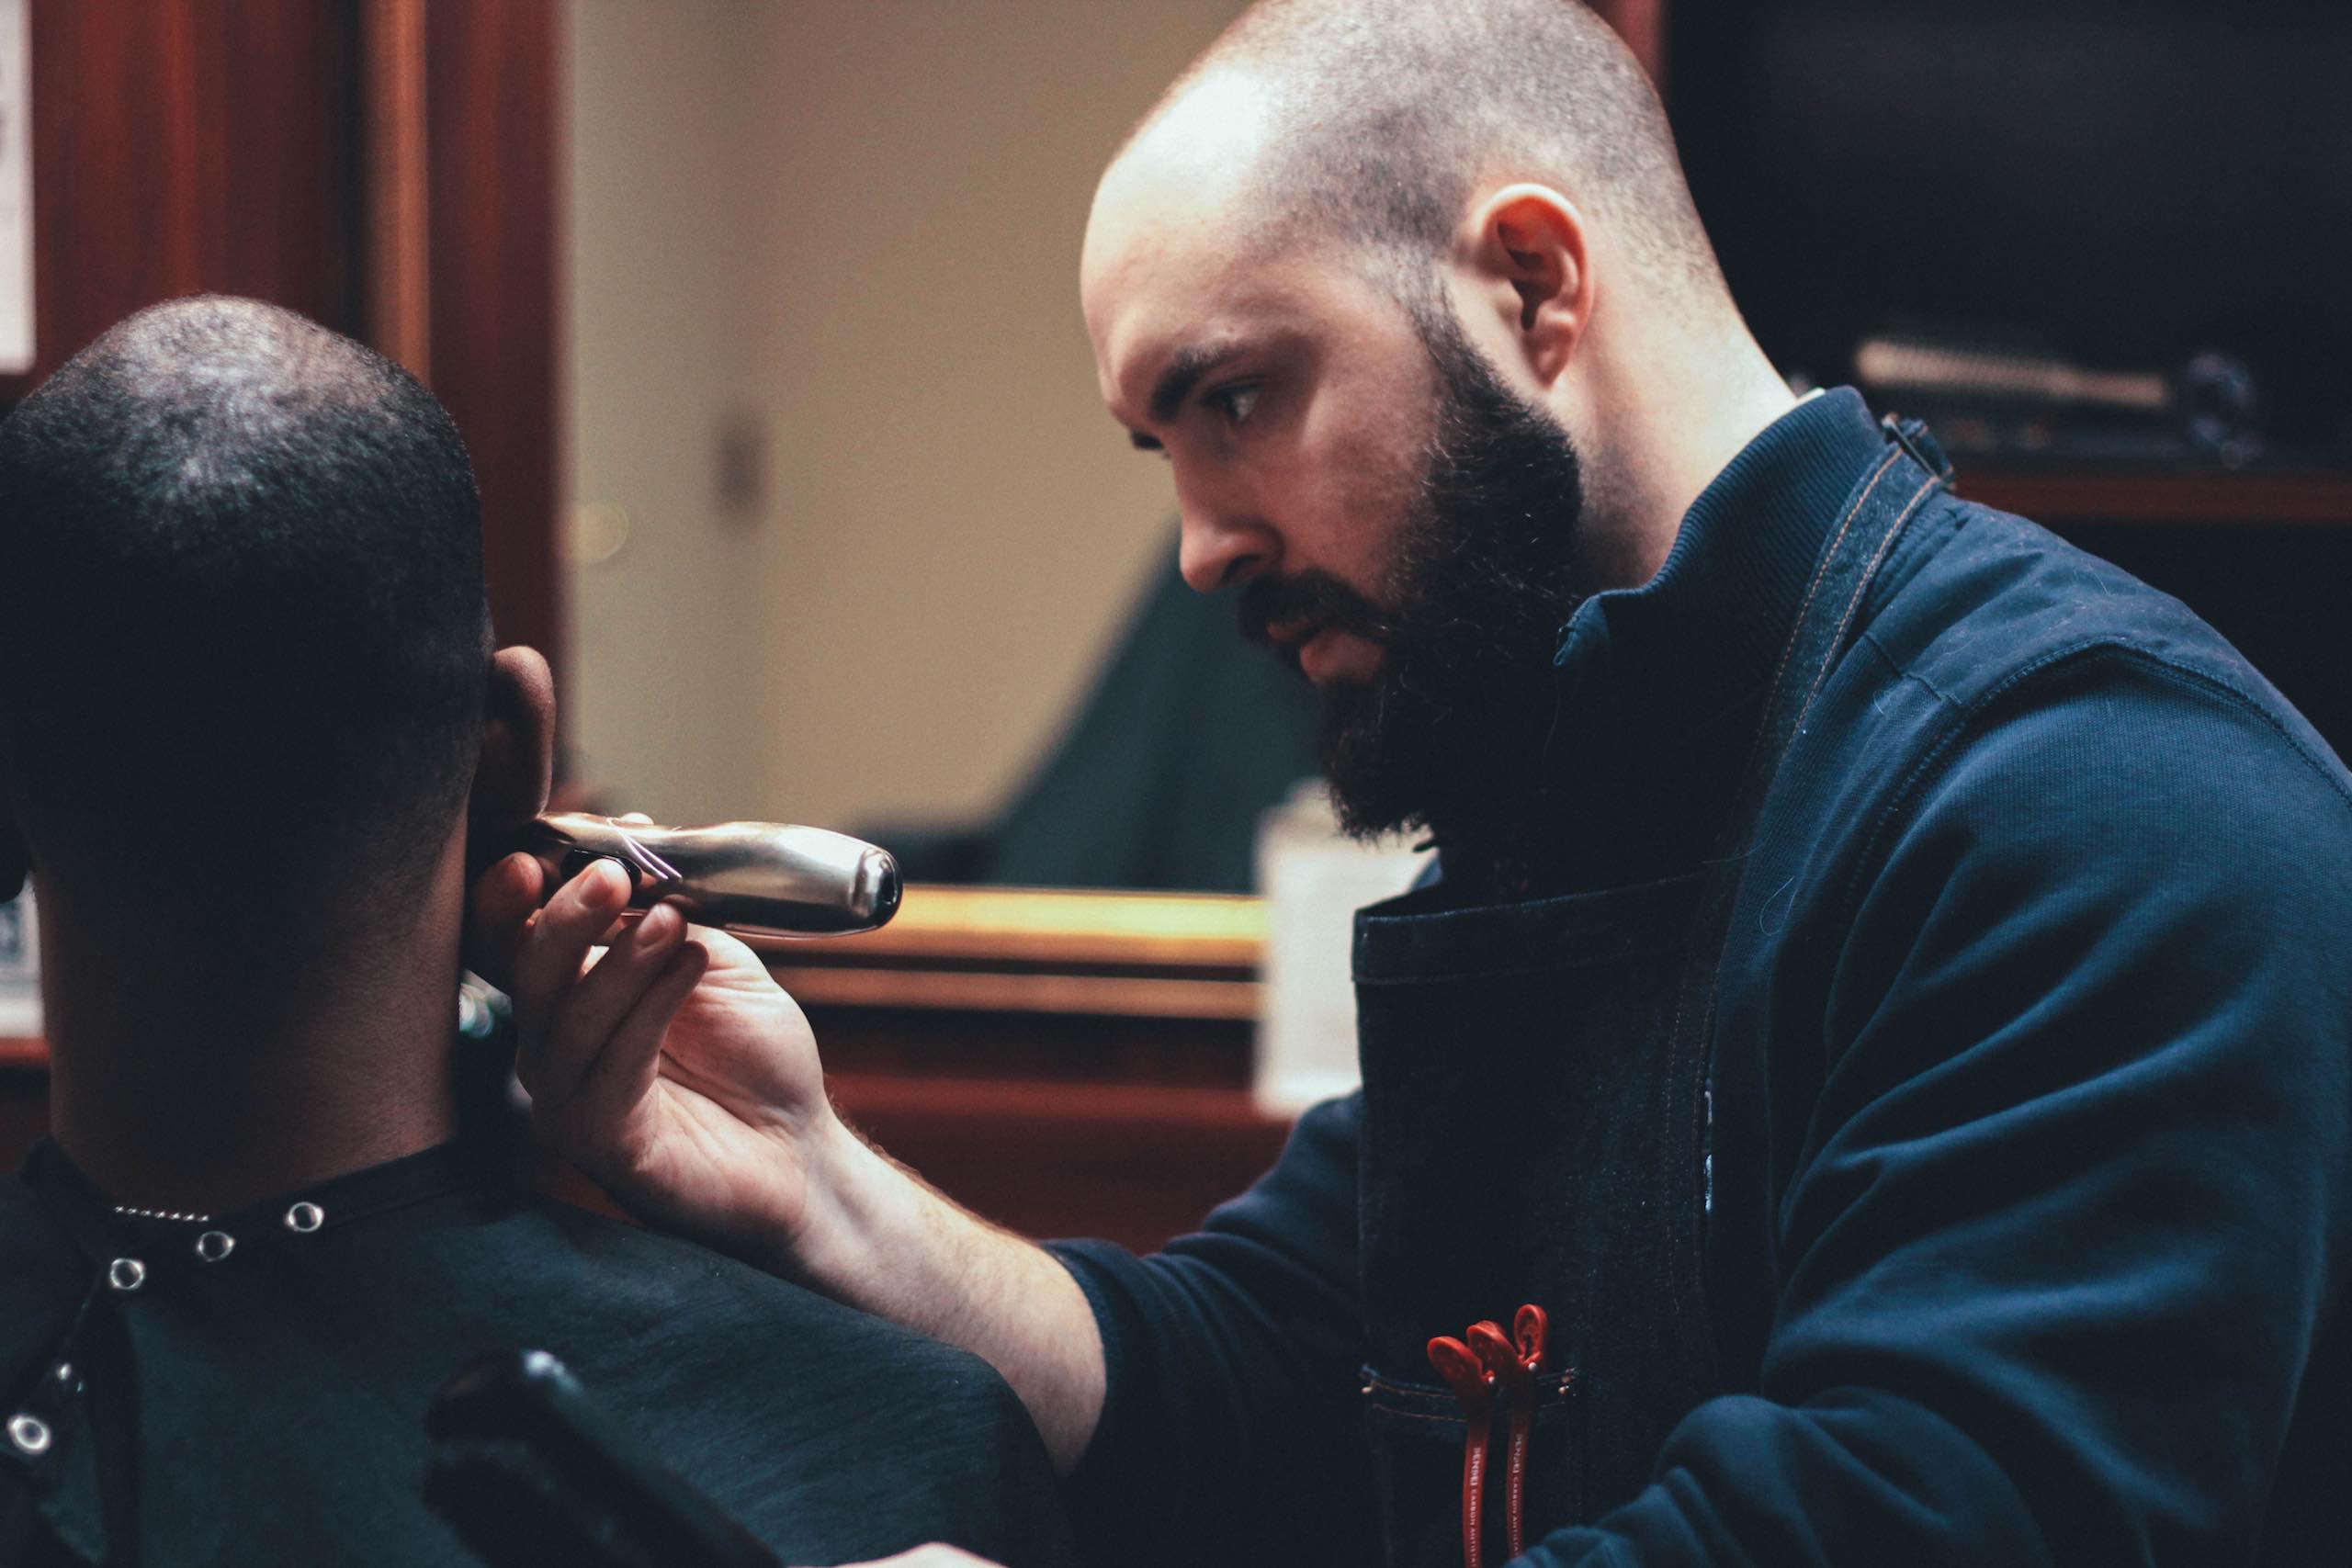 The QG Baltimore Barber Shop